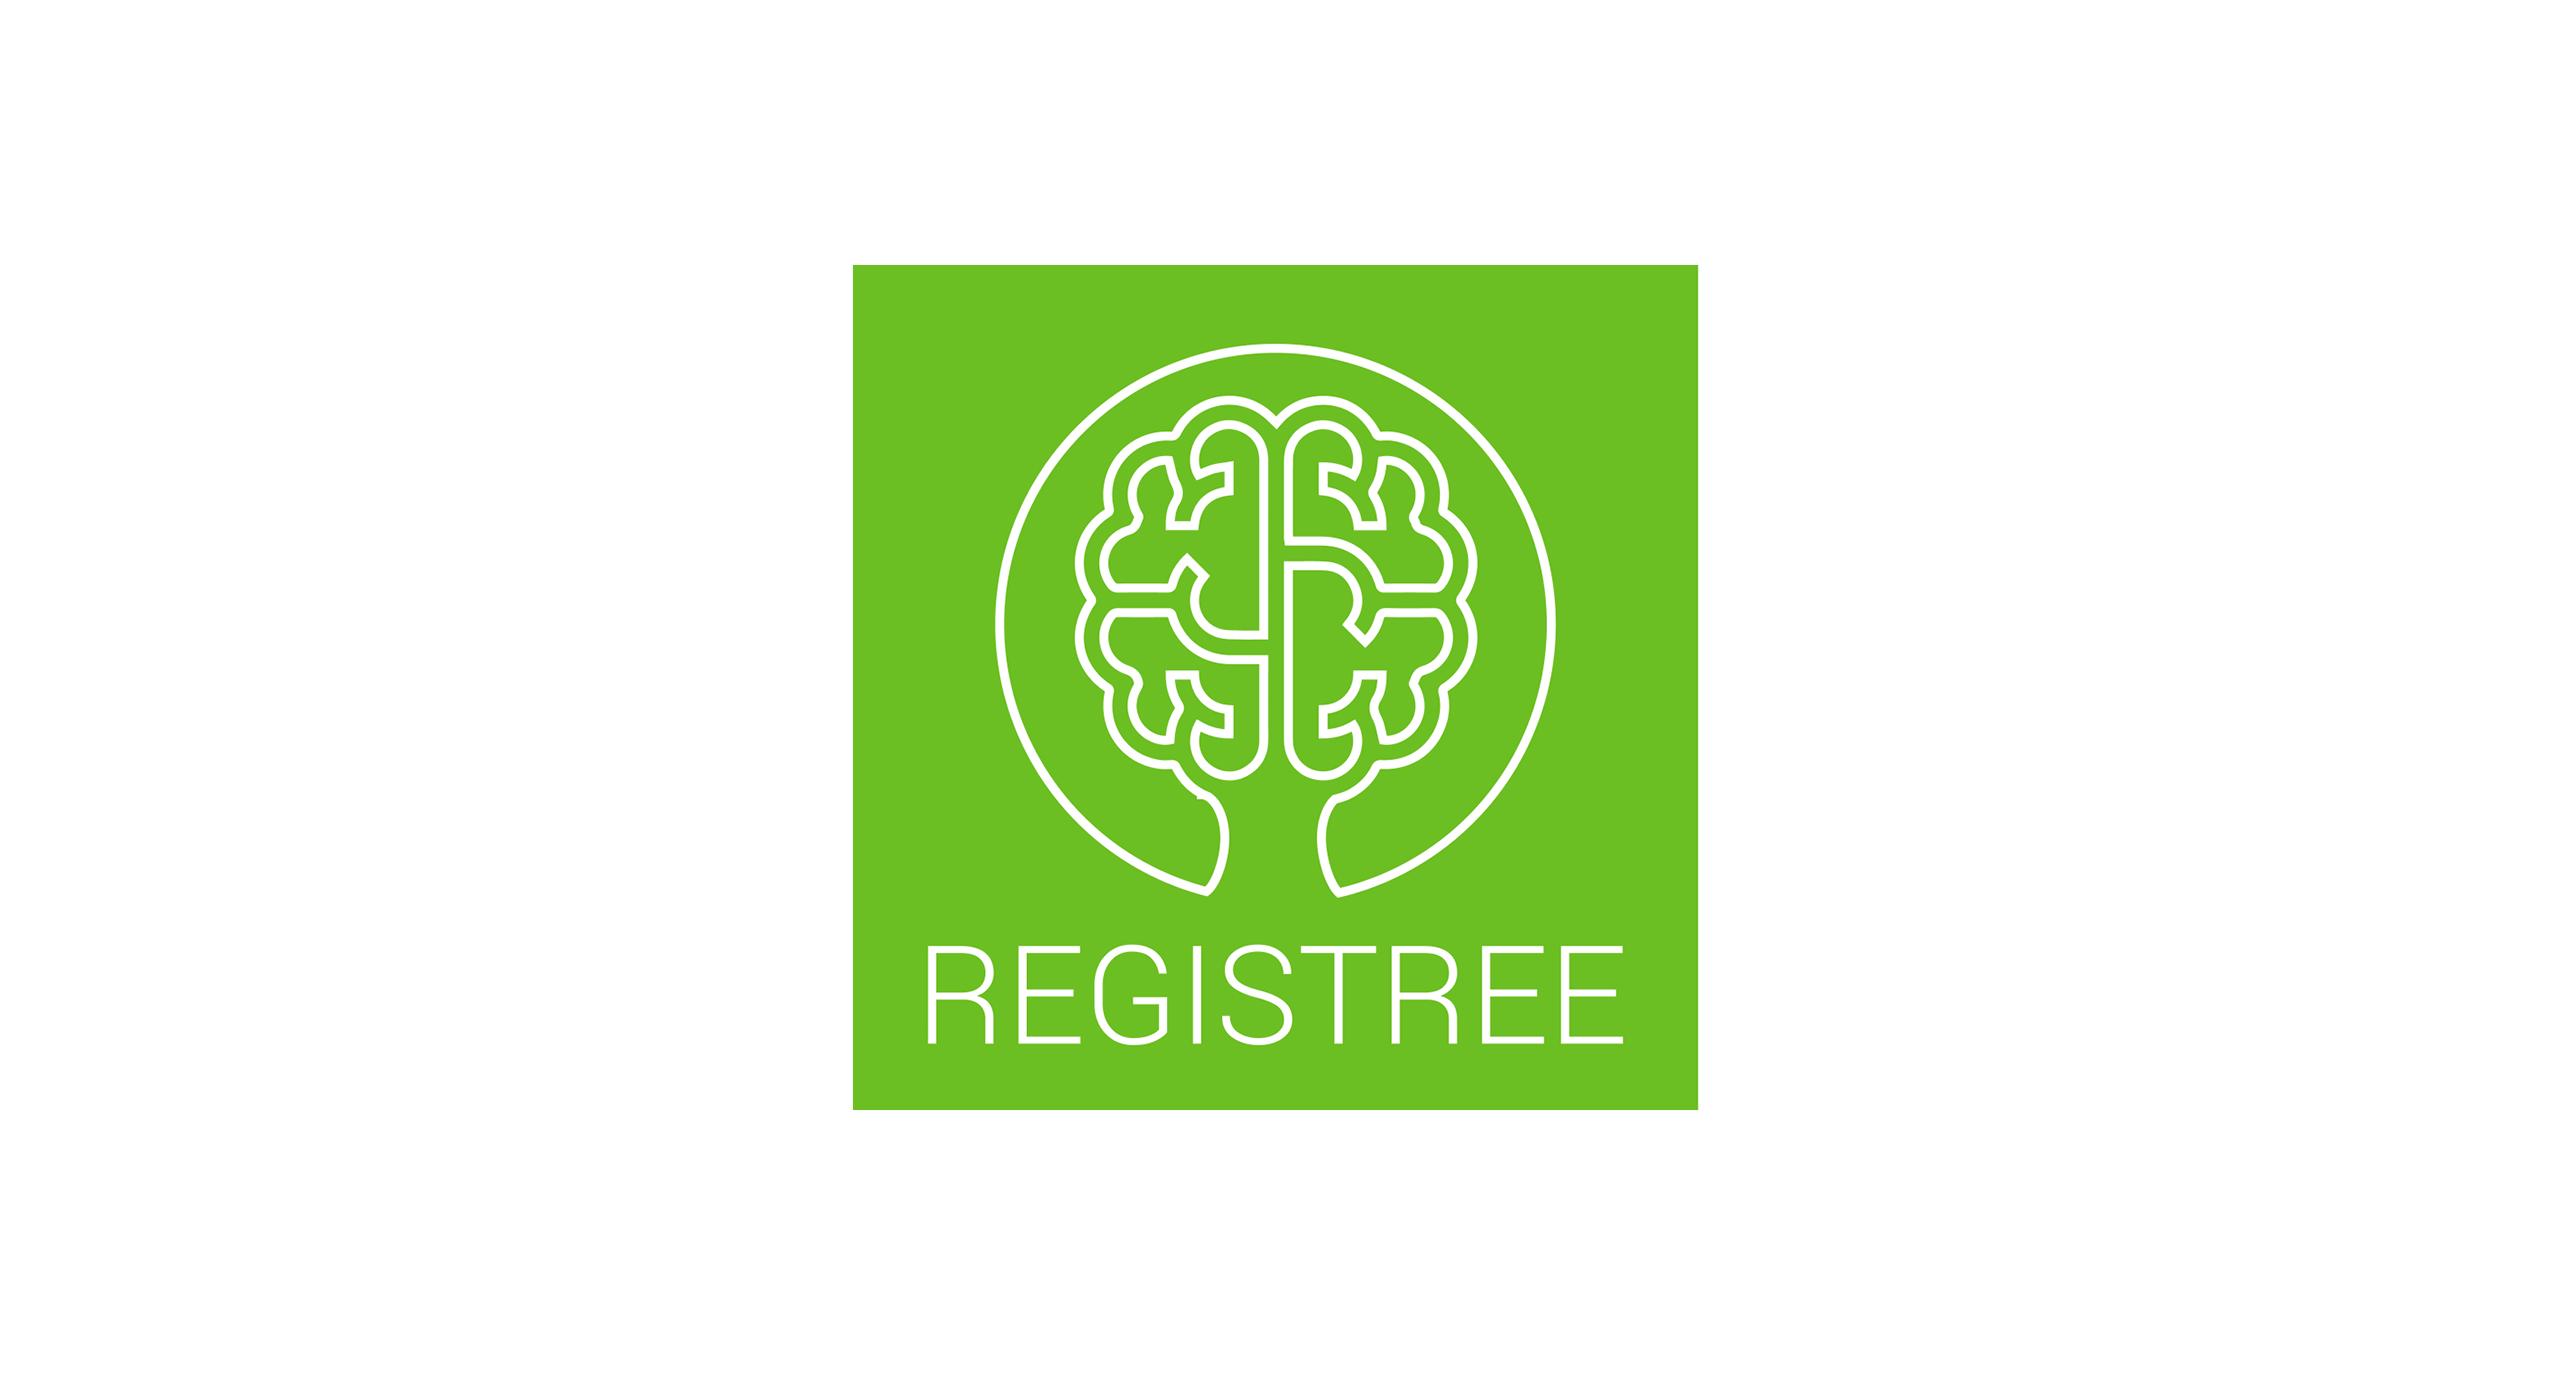 SAGEA_affiliate logos_Registree